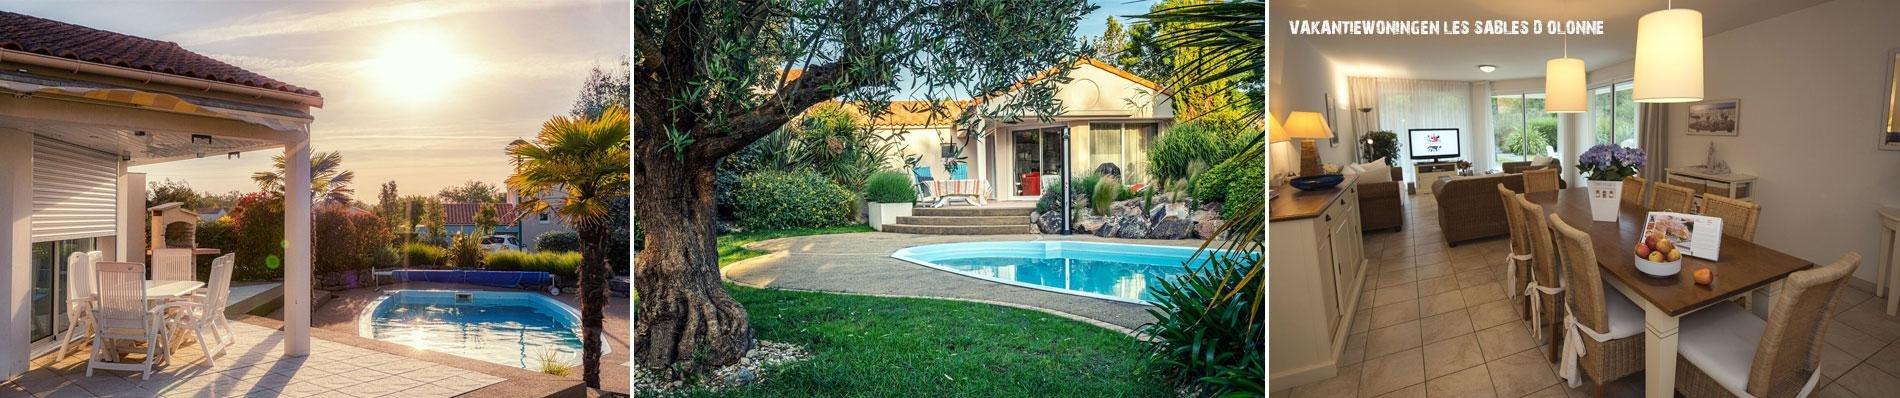 oasis parcs sables d olonne zomervakantie zwembad huis villa